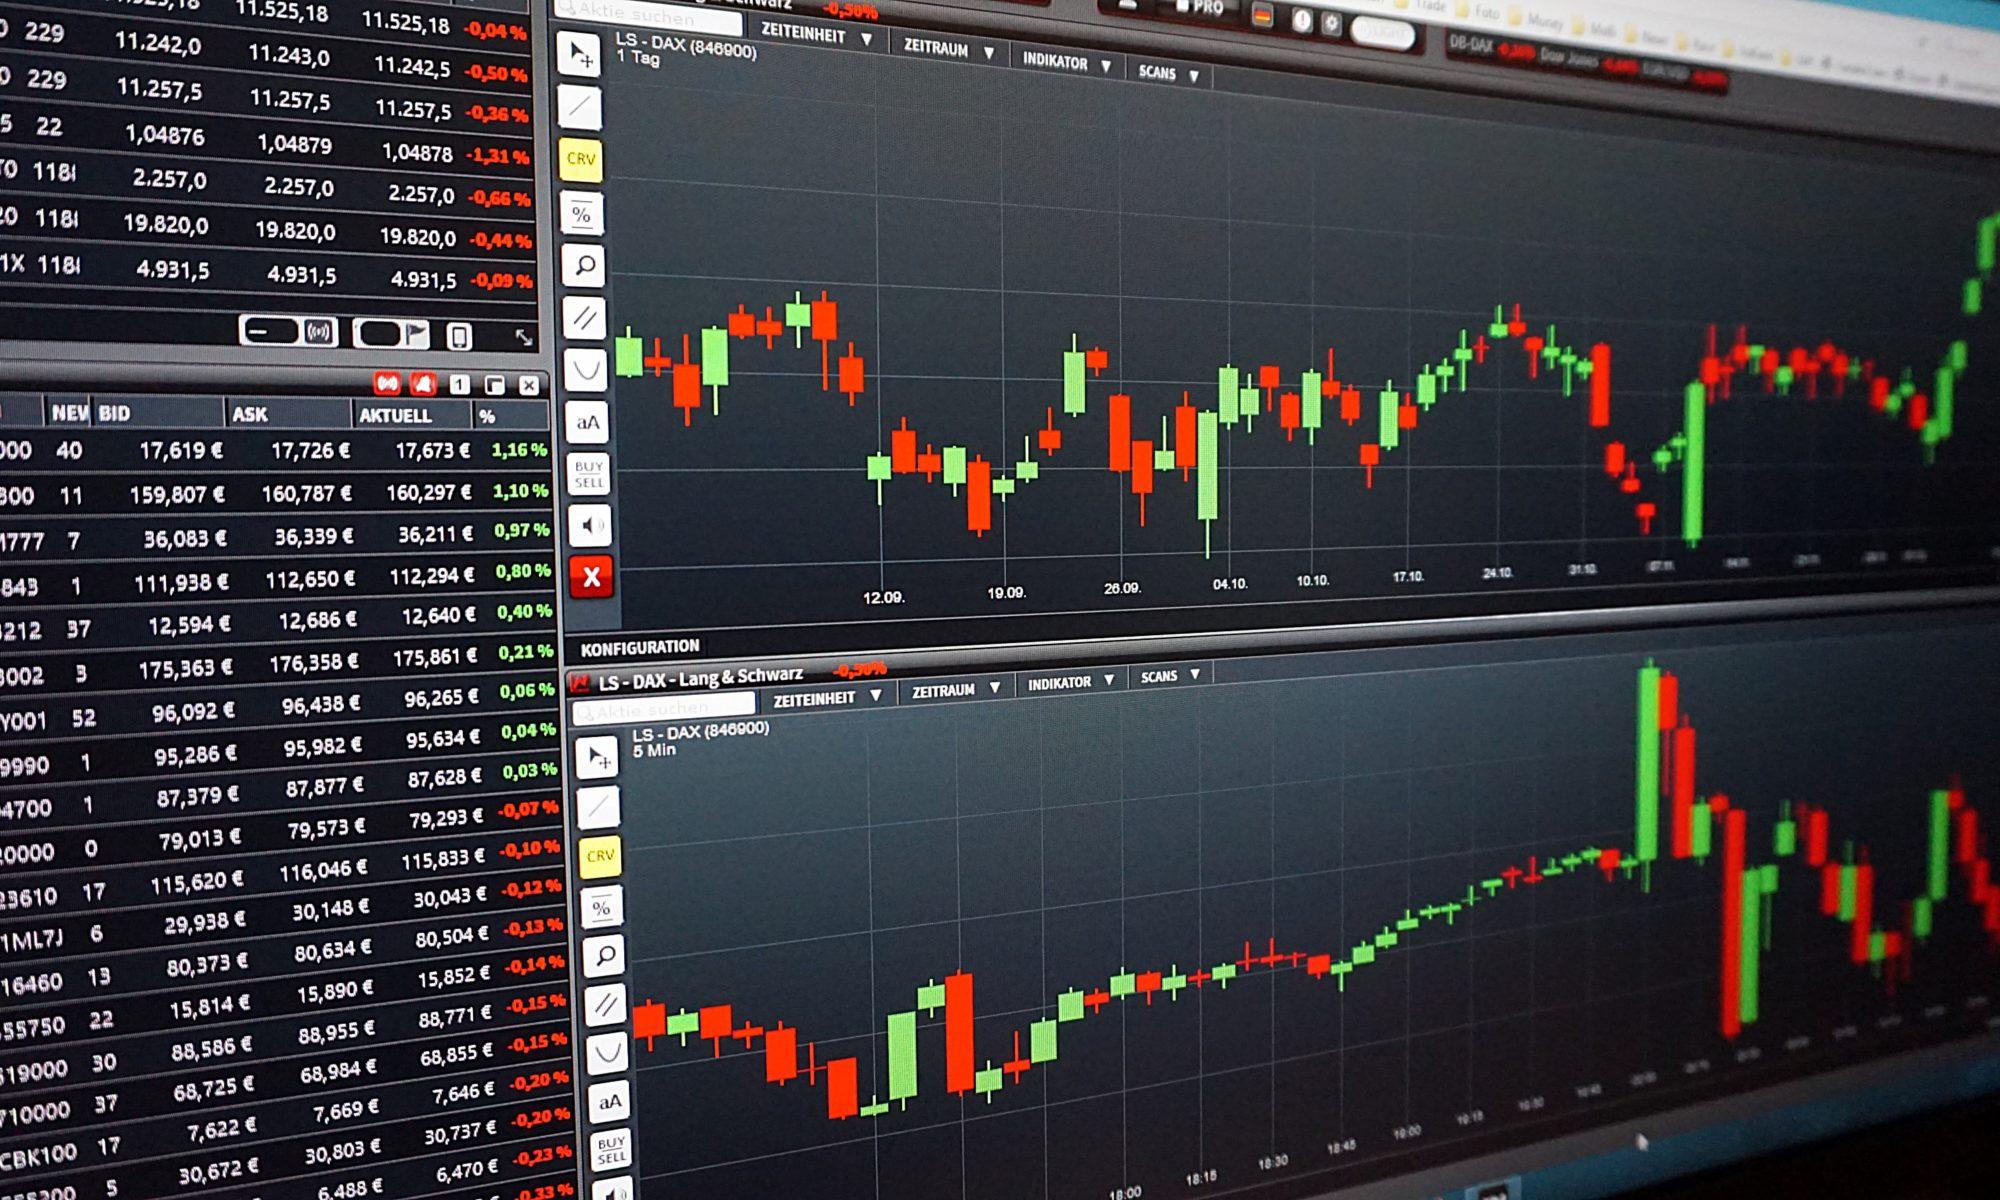 Moyenne mobile en trading